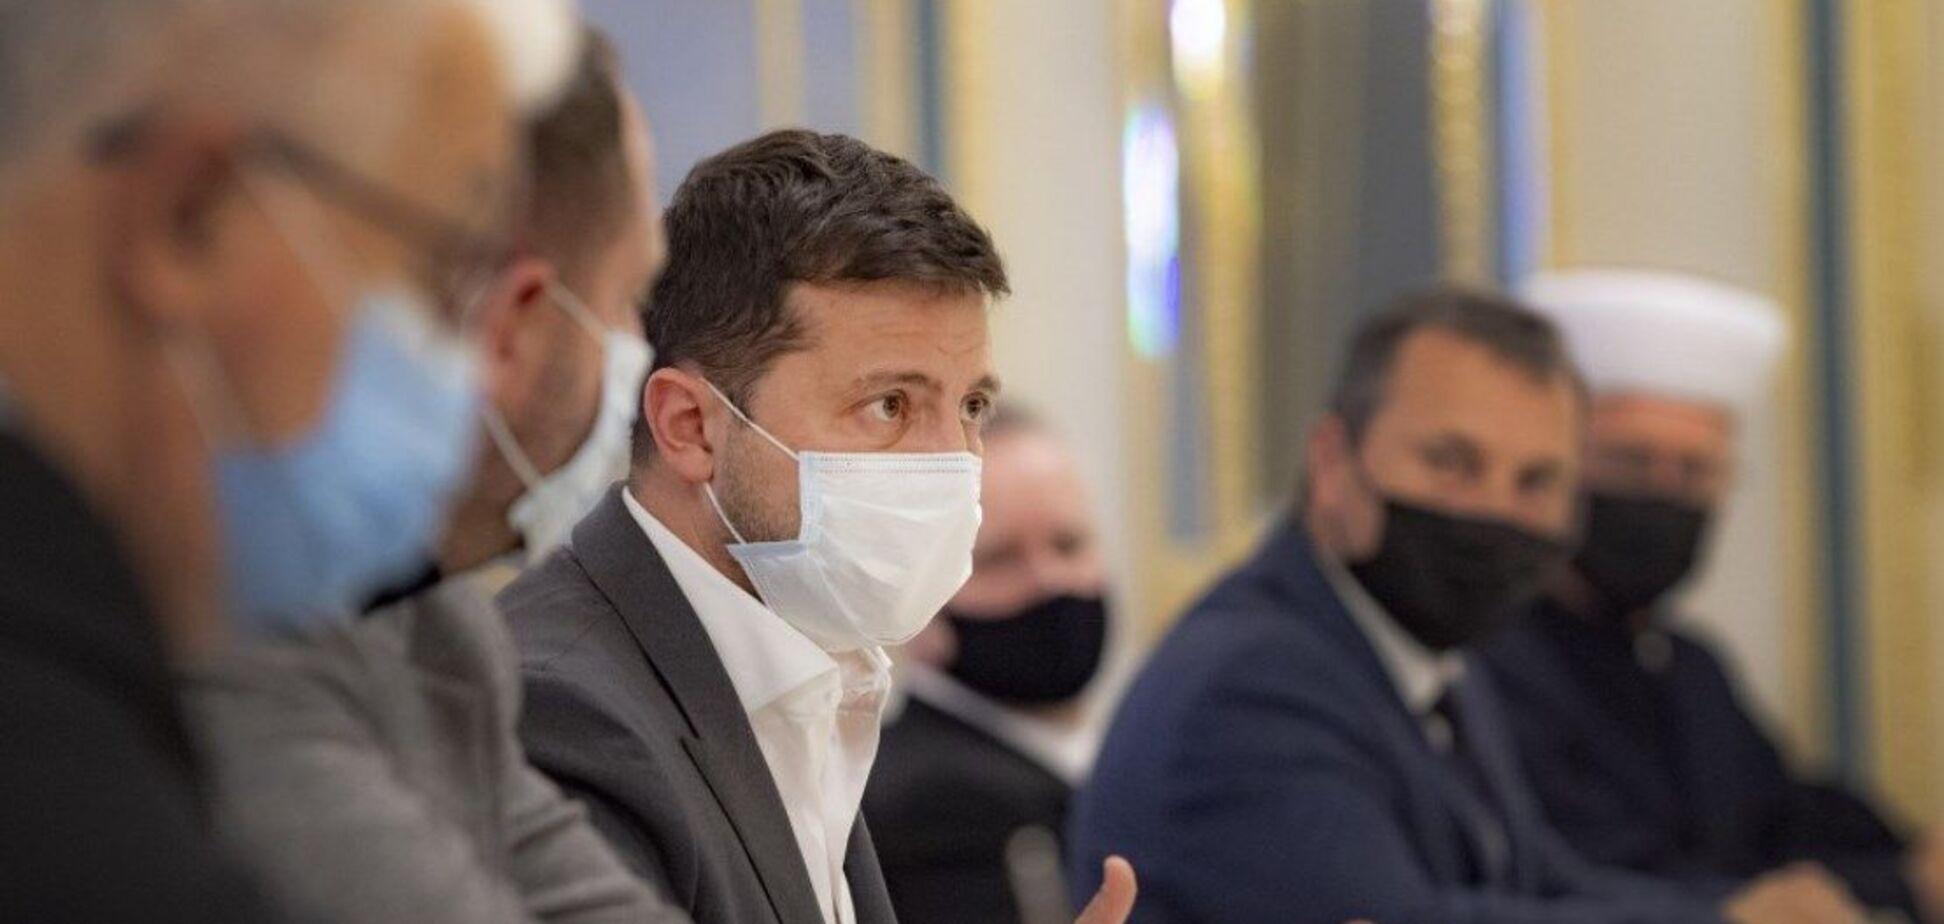 Зеленский обсудил ситуацию с коронавирусом с ВСЦиРО